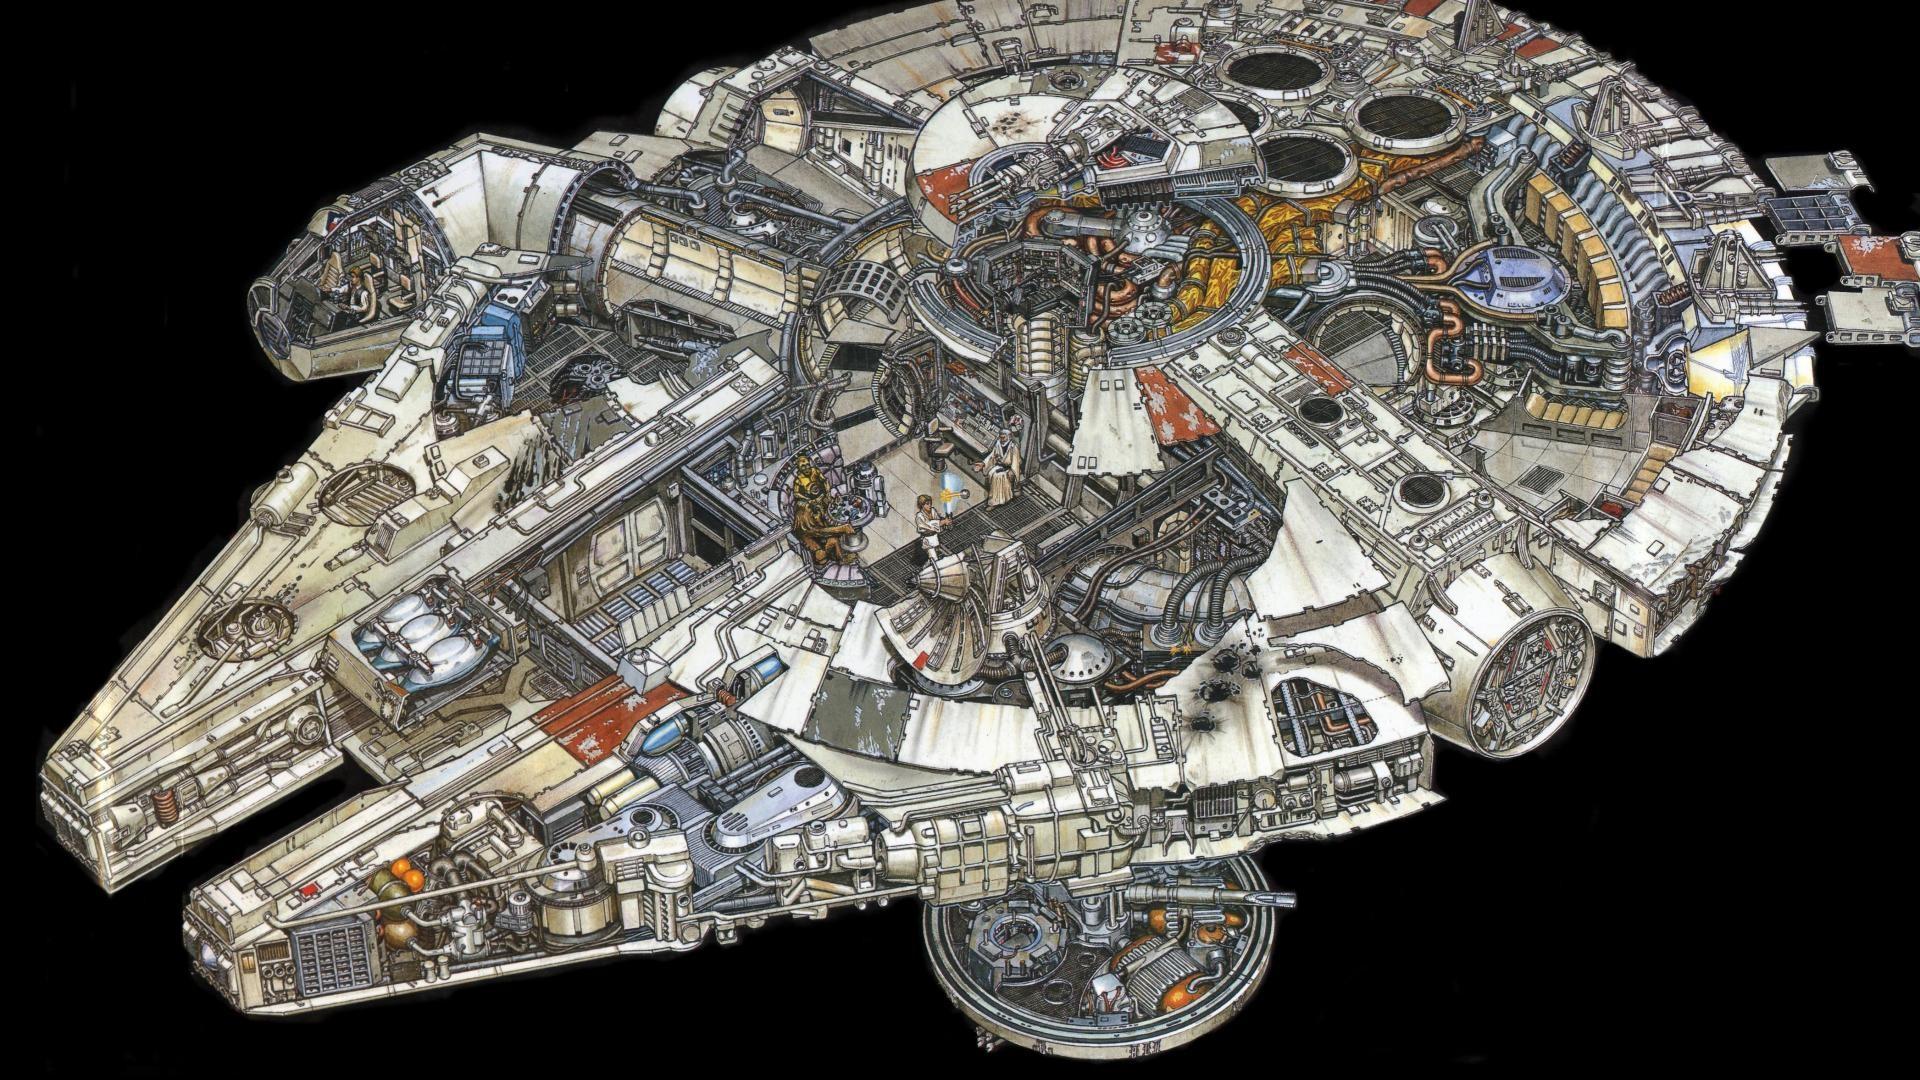 star wars movies spaceships millenium falcon hd wallpaper . …